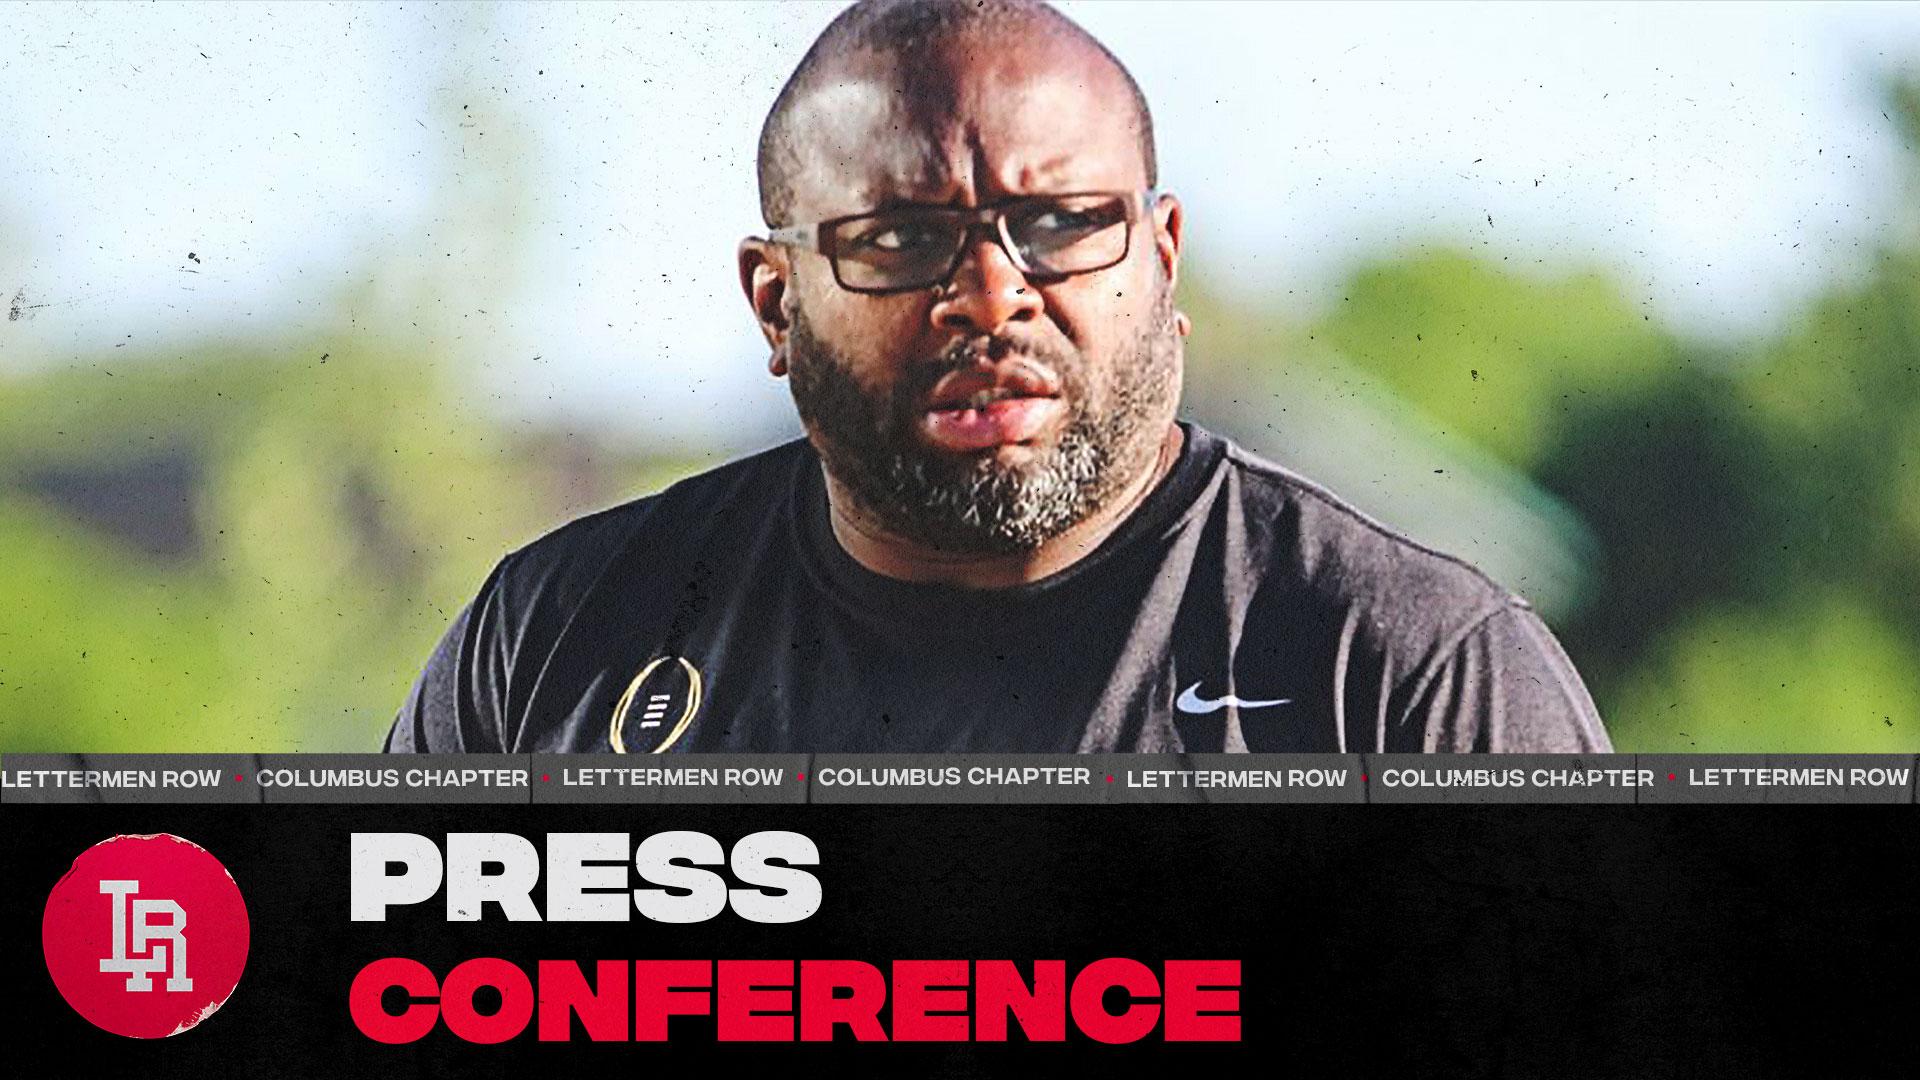 Tony-Alford-press-Conference-323